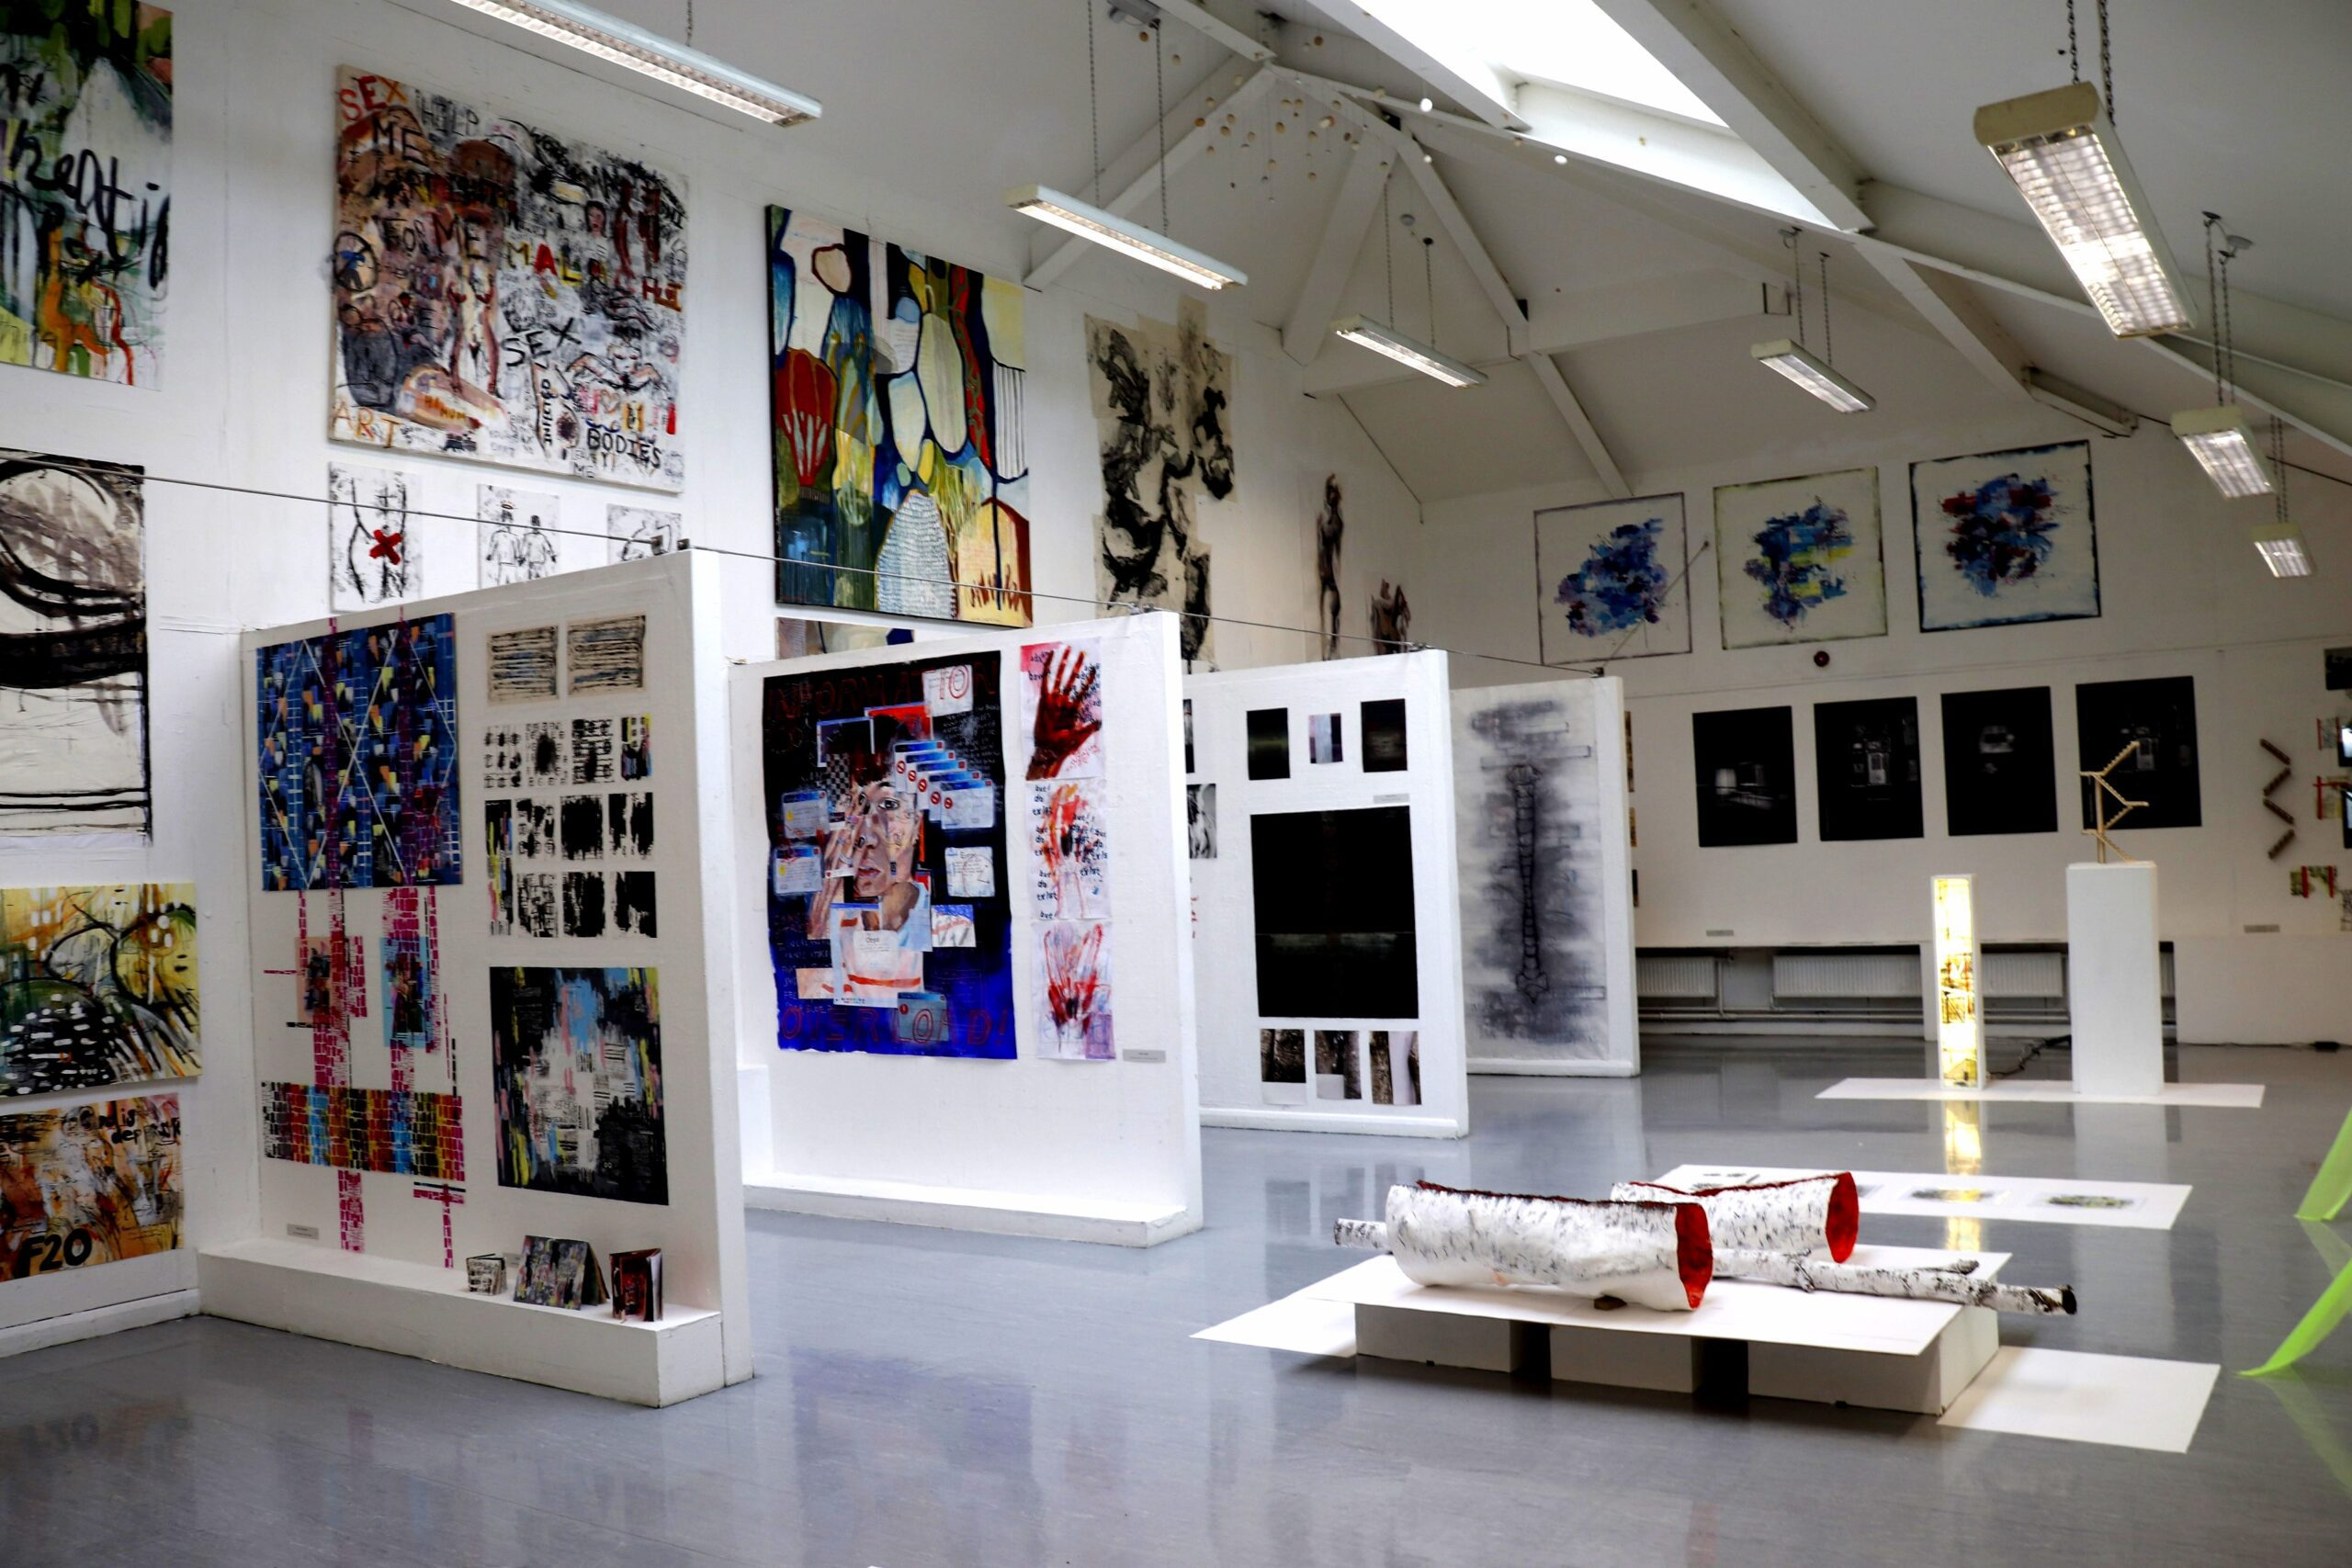 Greenhead College Art Exhibition 2021